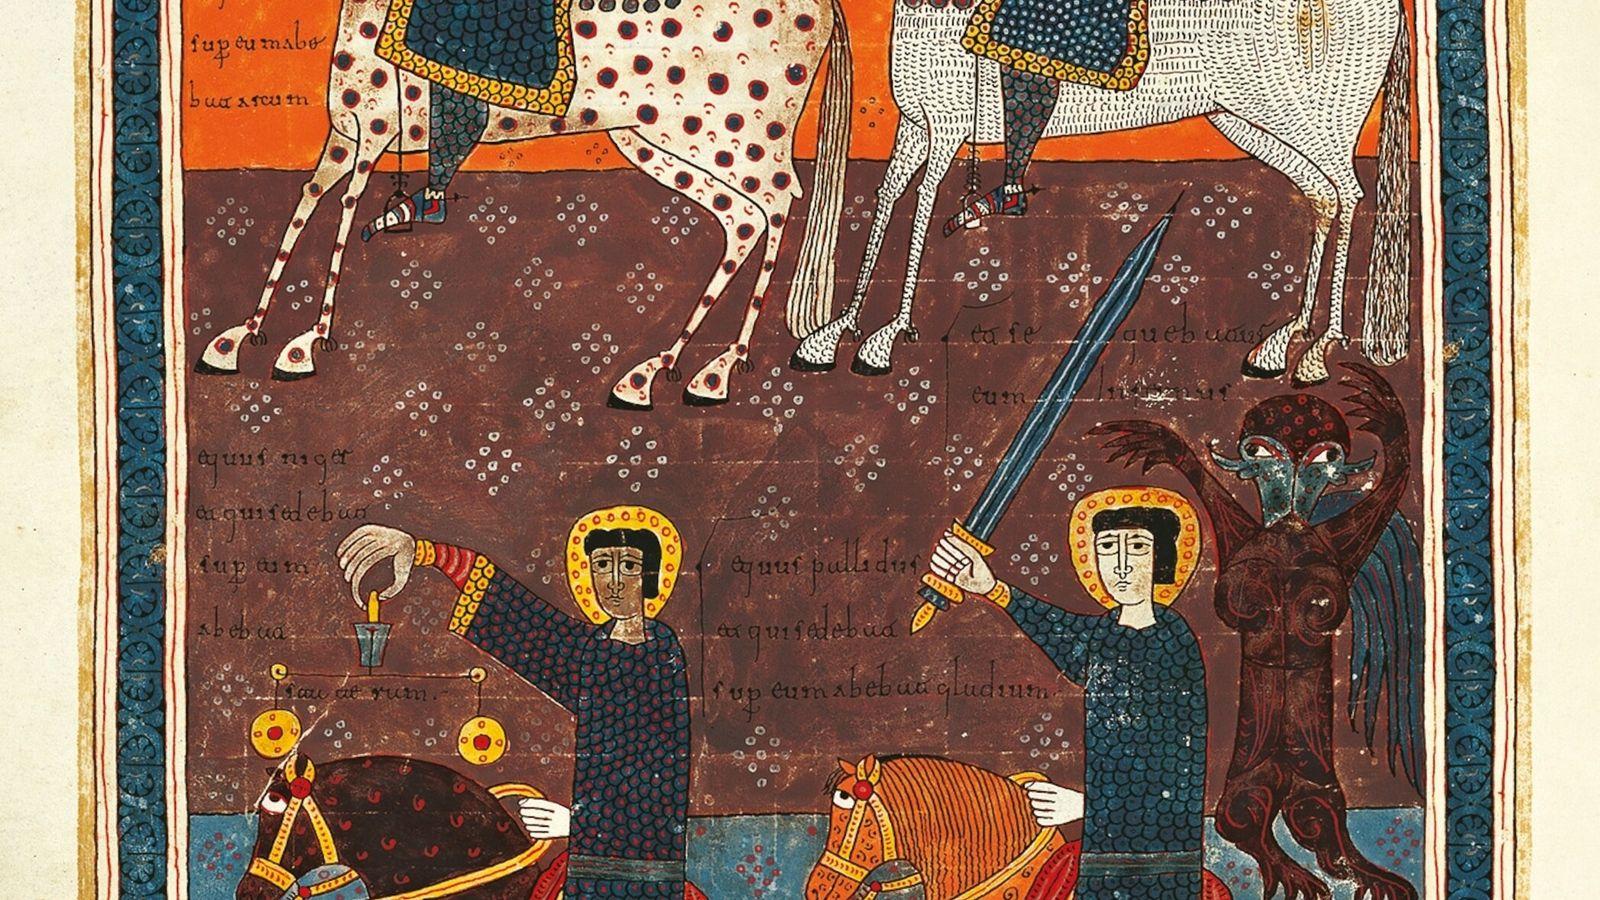 Four horsemen of the apocalpyse